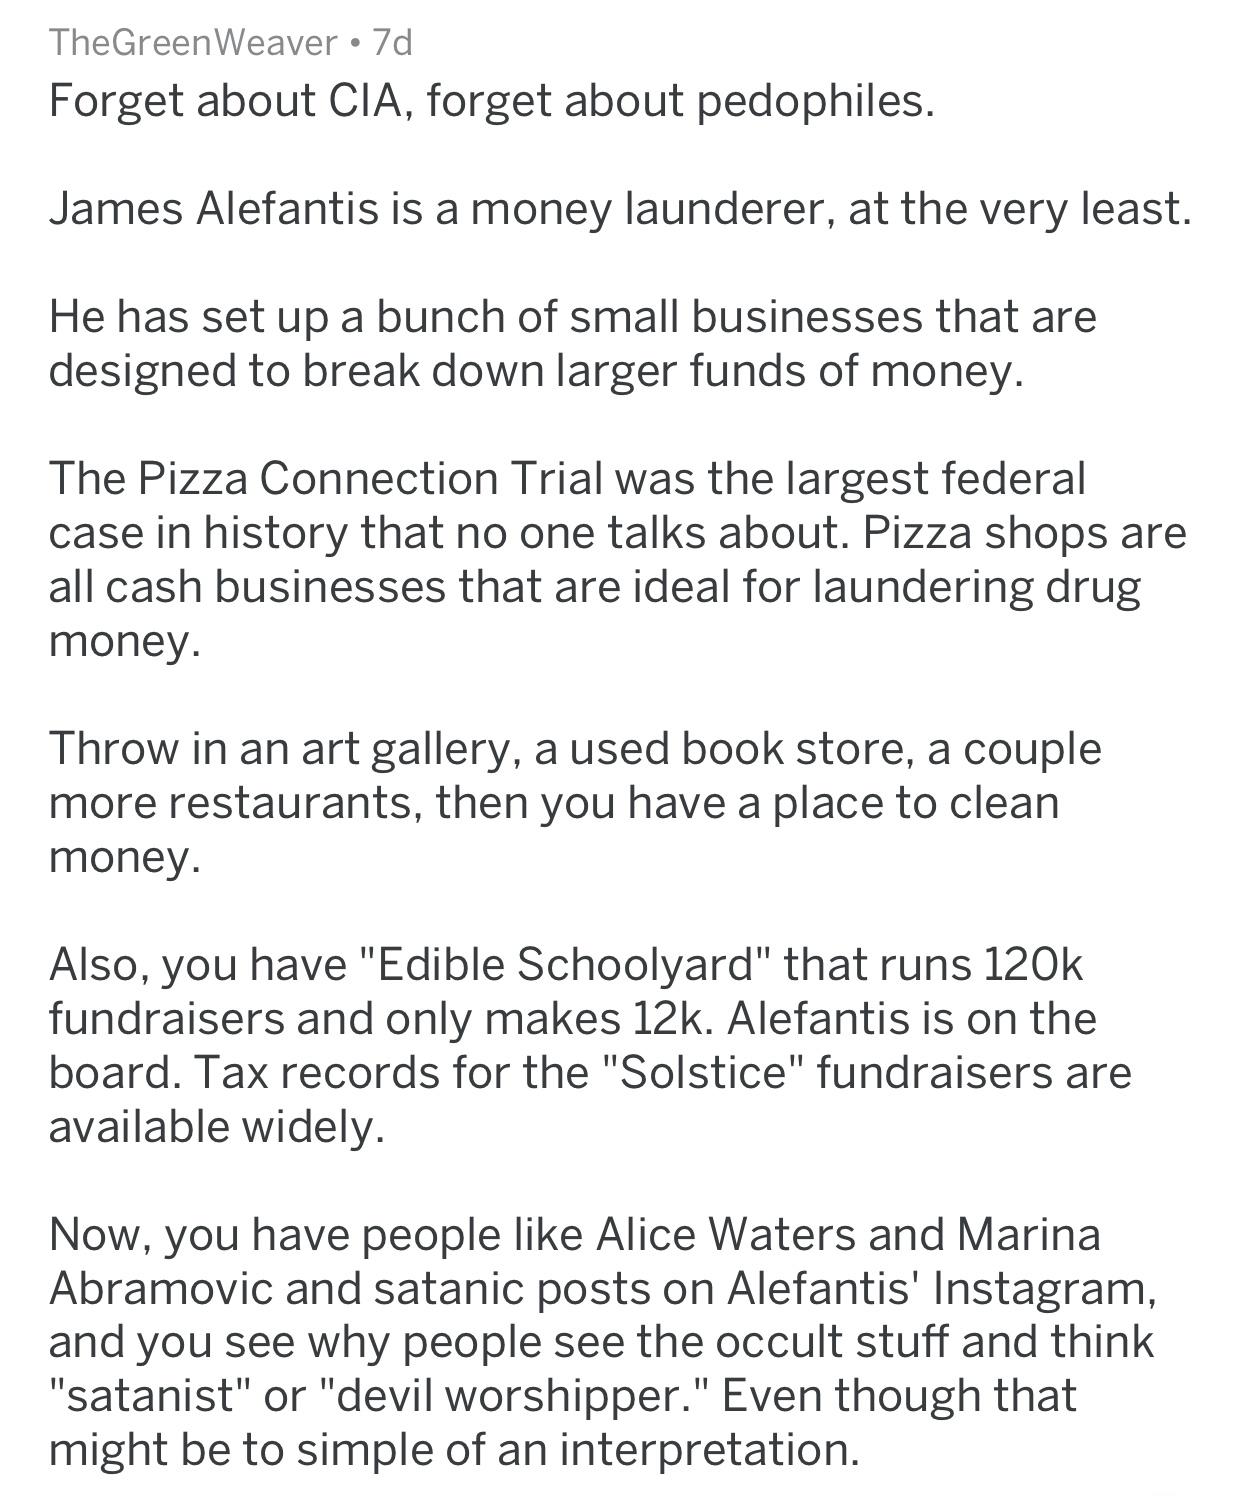 One opinion about James Alefantis, John Podesta, et al